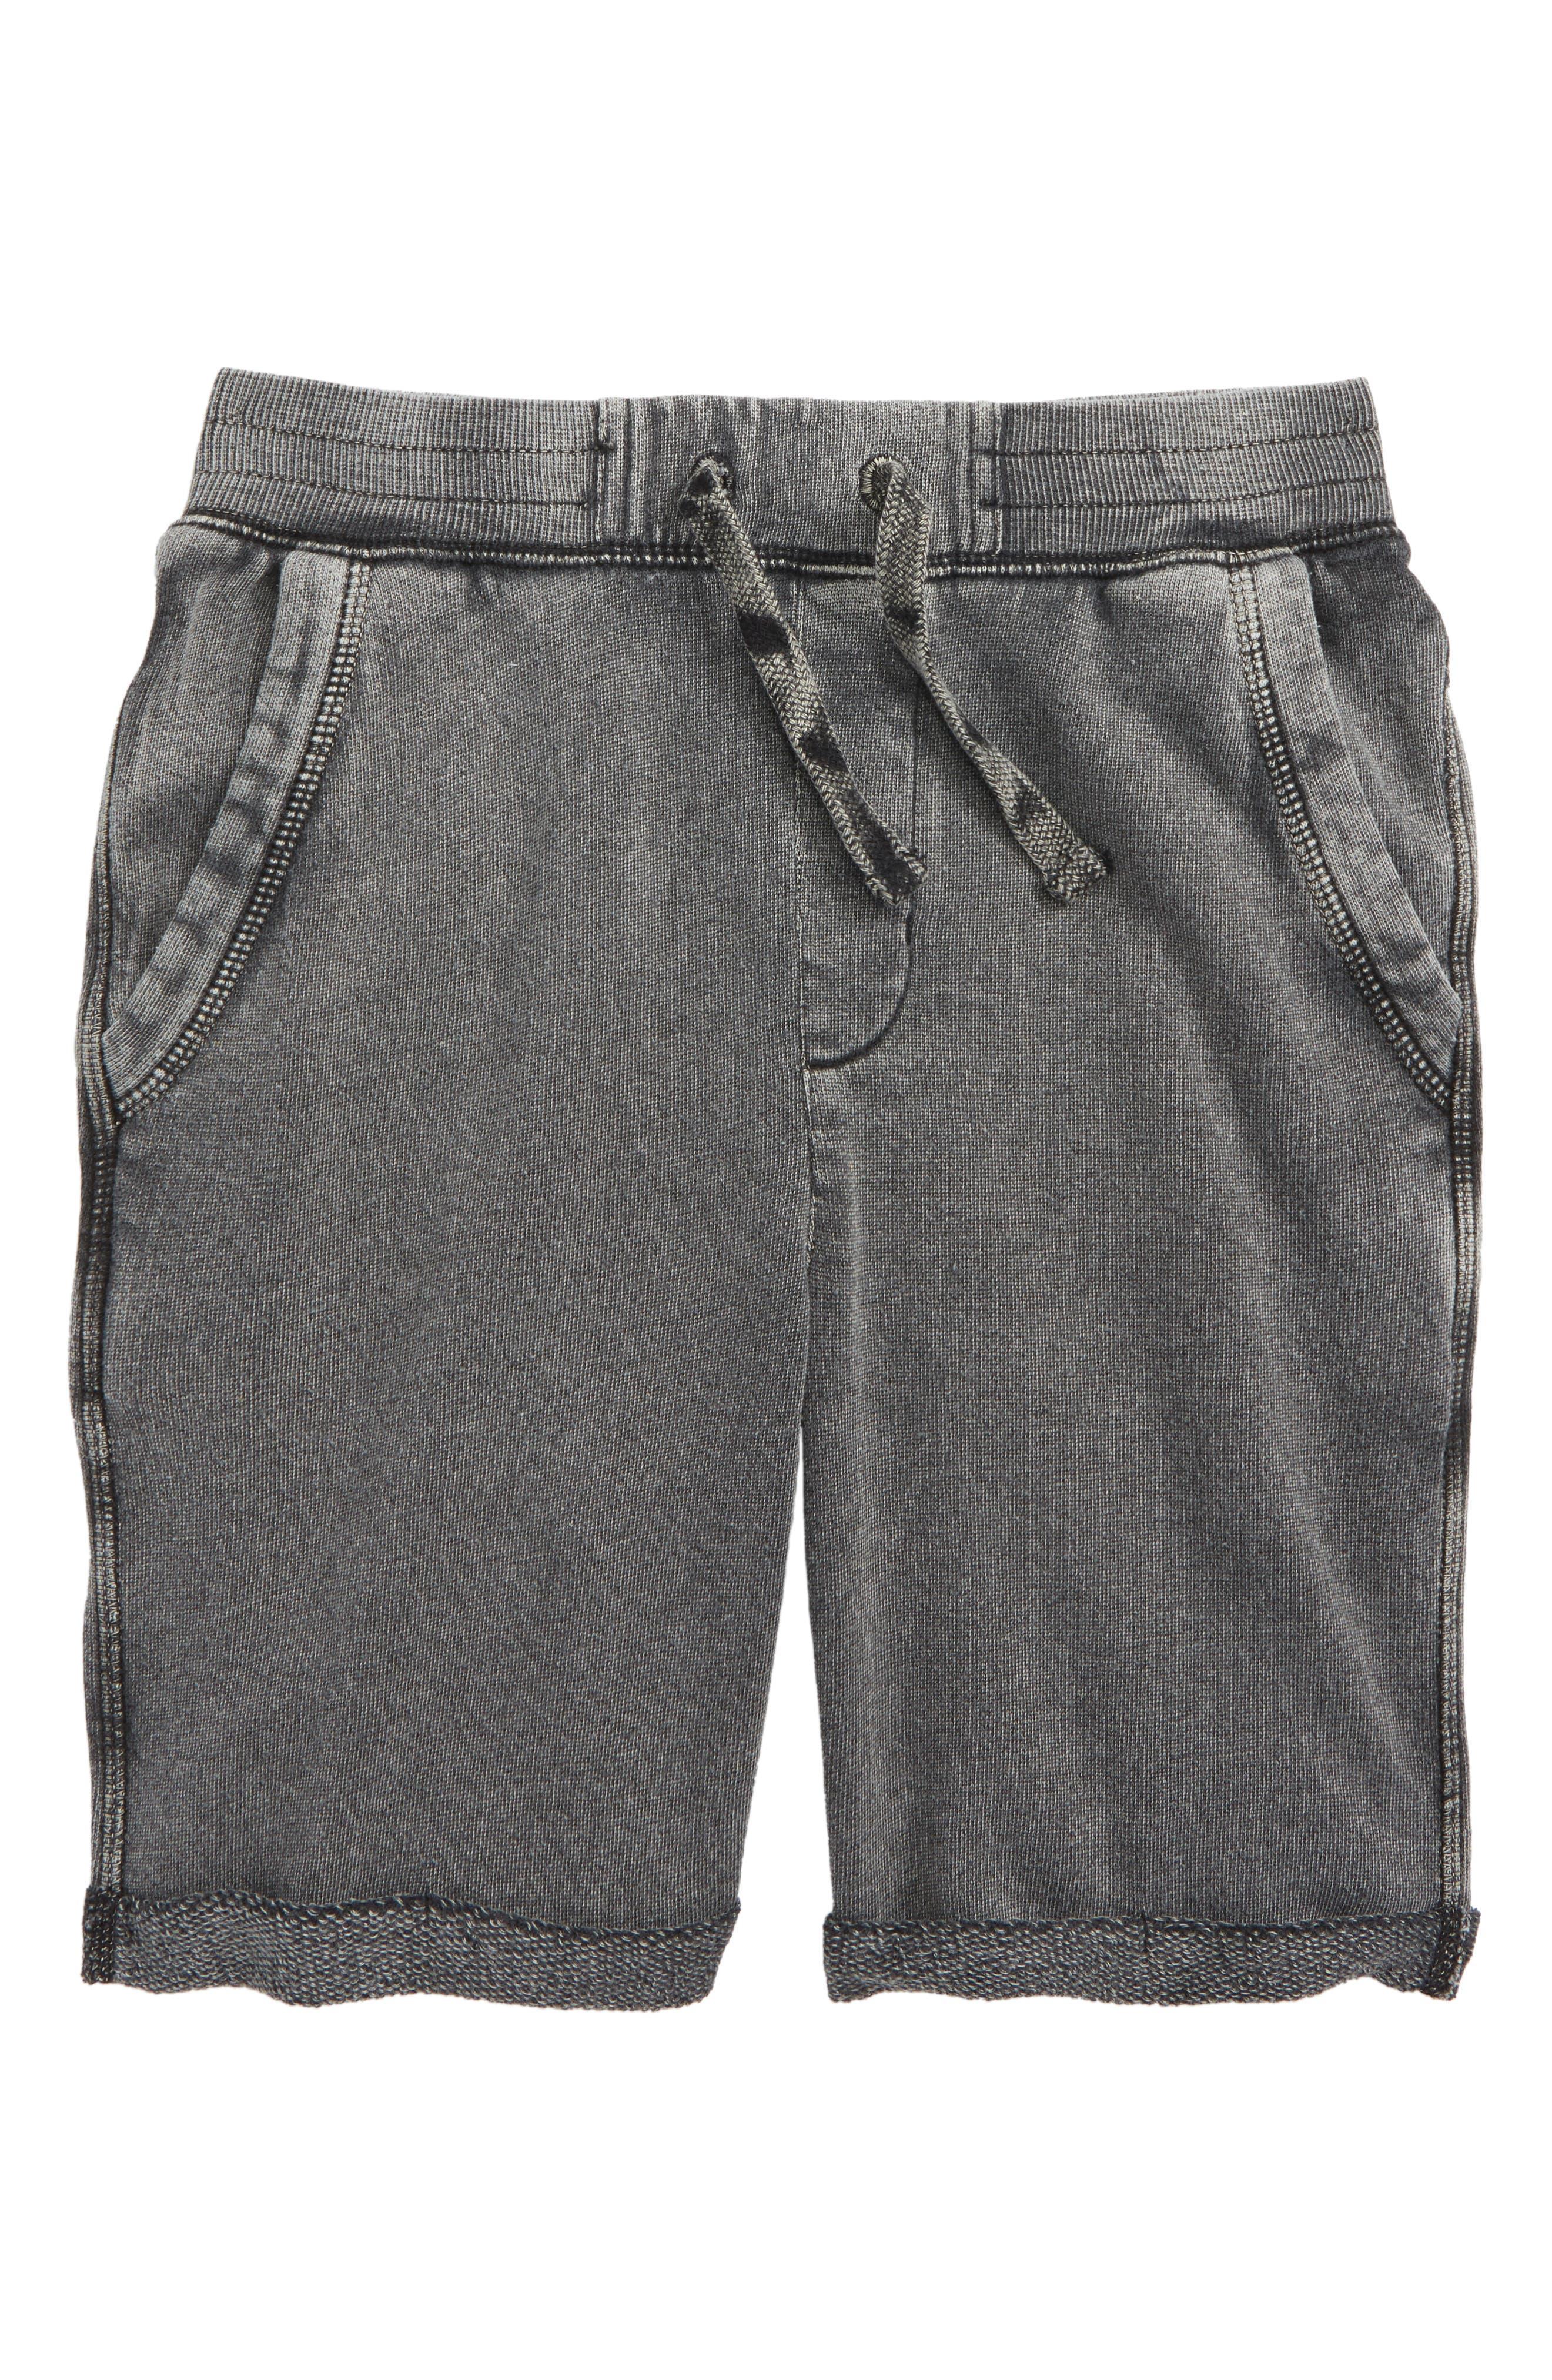 TUCKER + TATE Fleece Shorts, Main, color, 001